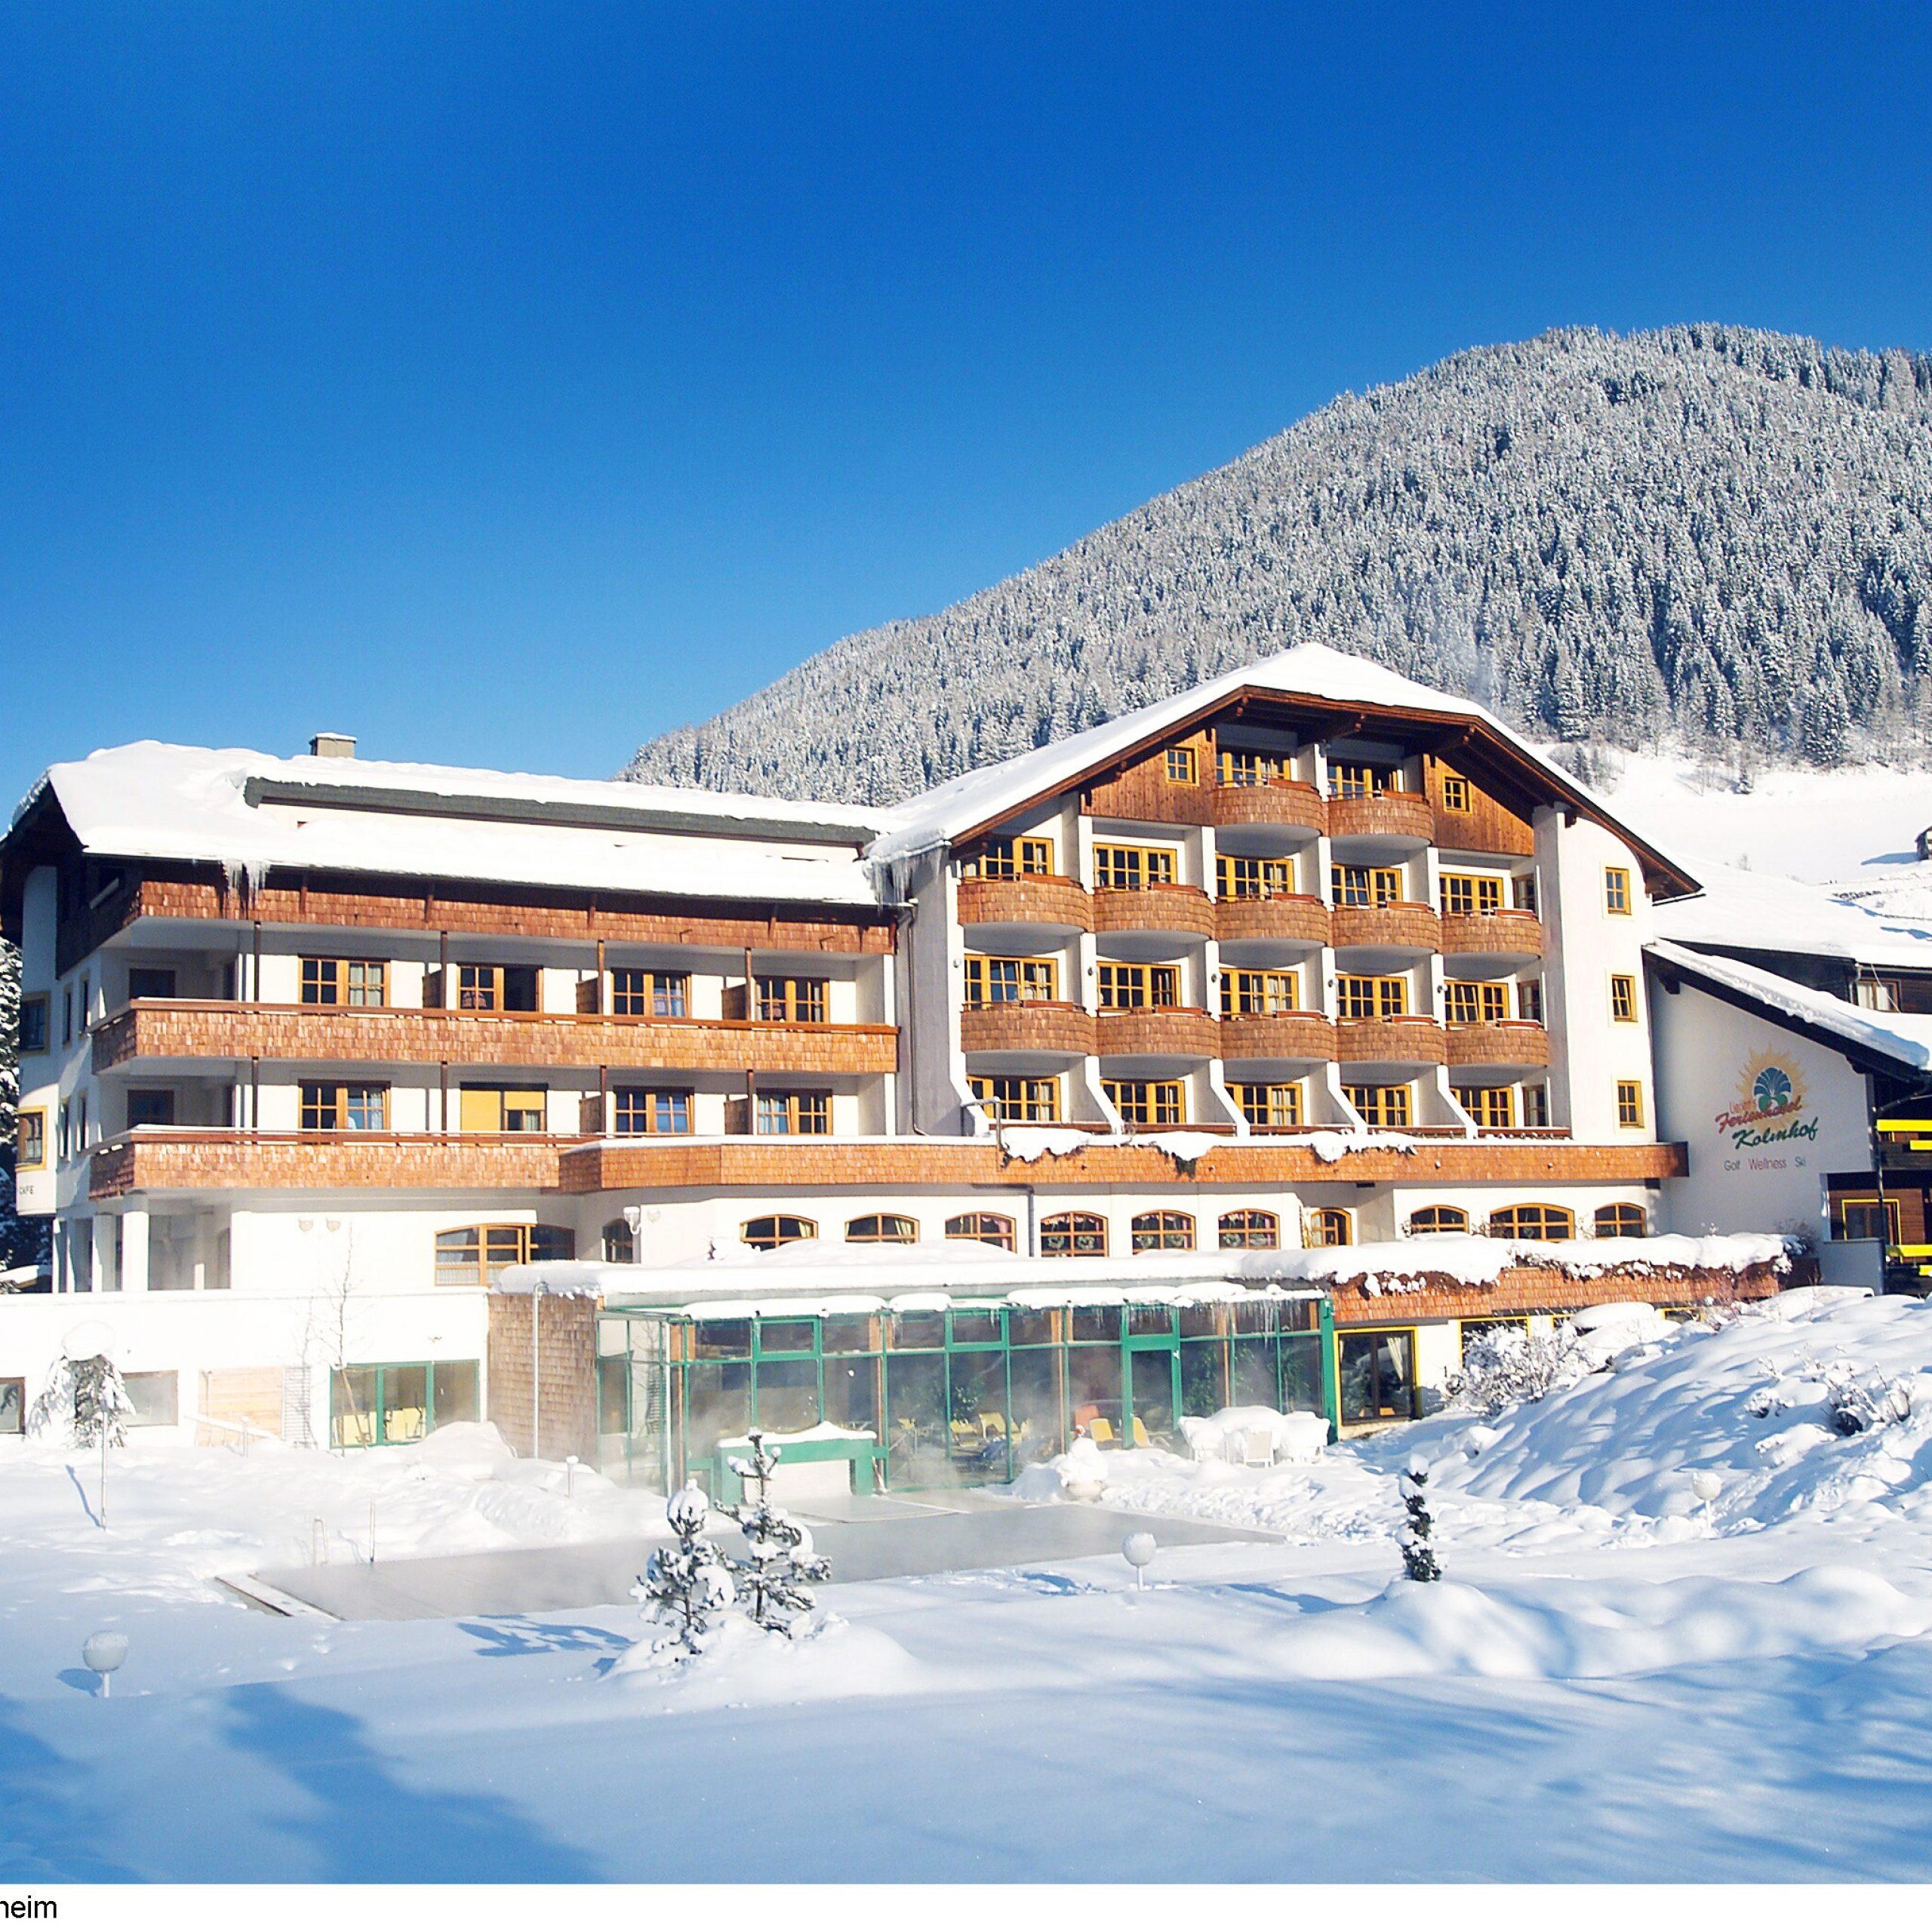 Austrija, Bad Kleinkirchheim, Hotel Kolmhof